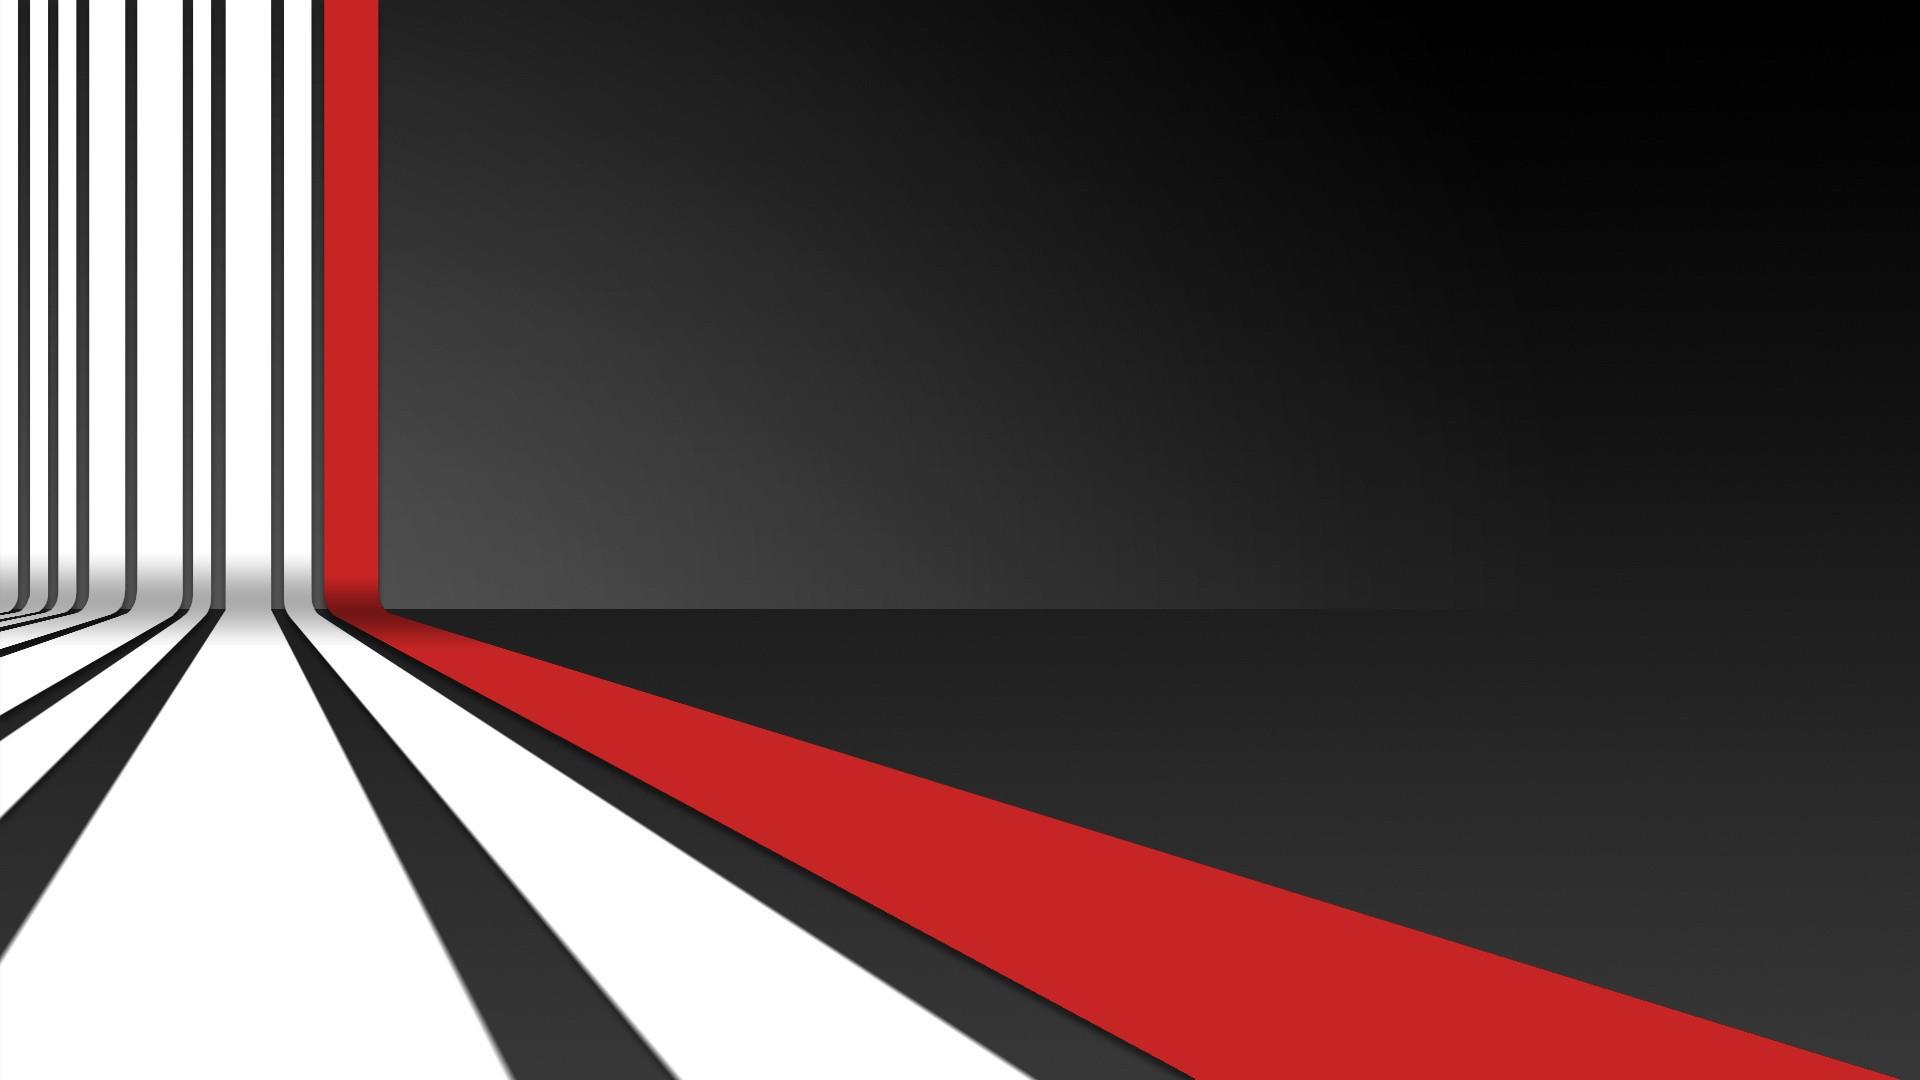 ed1c0dc9b6d Red Wallpaper 1920x1080 Abstract Red White Digital Art Black 1920x1080